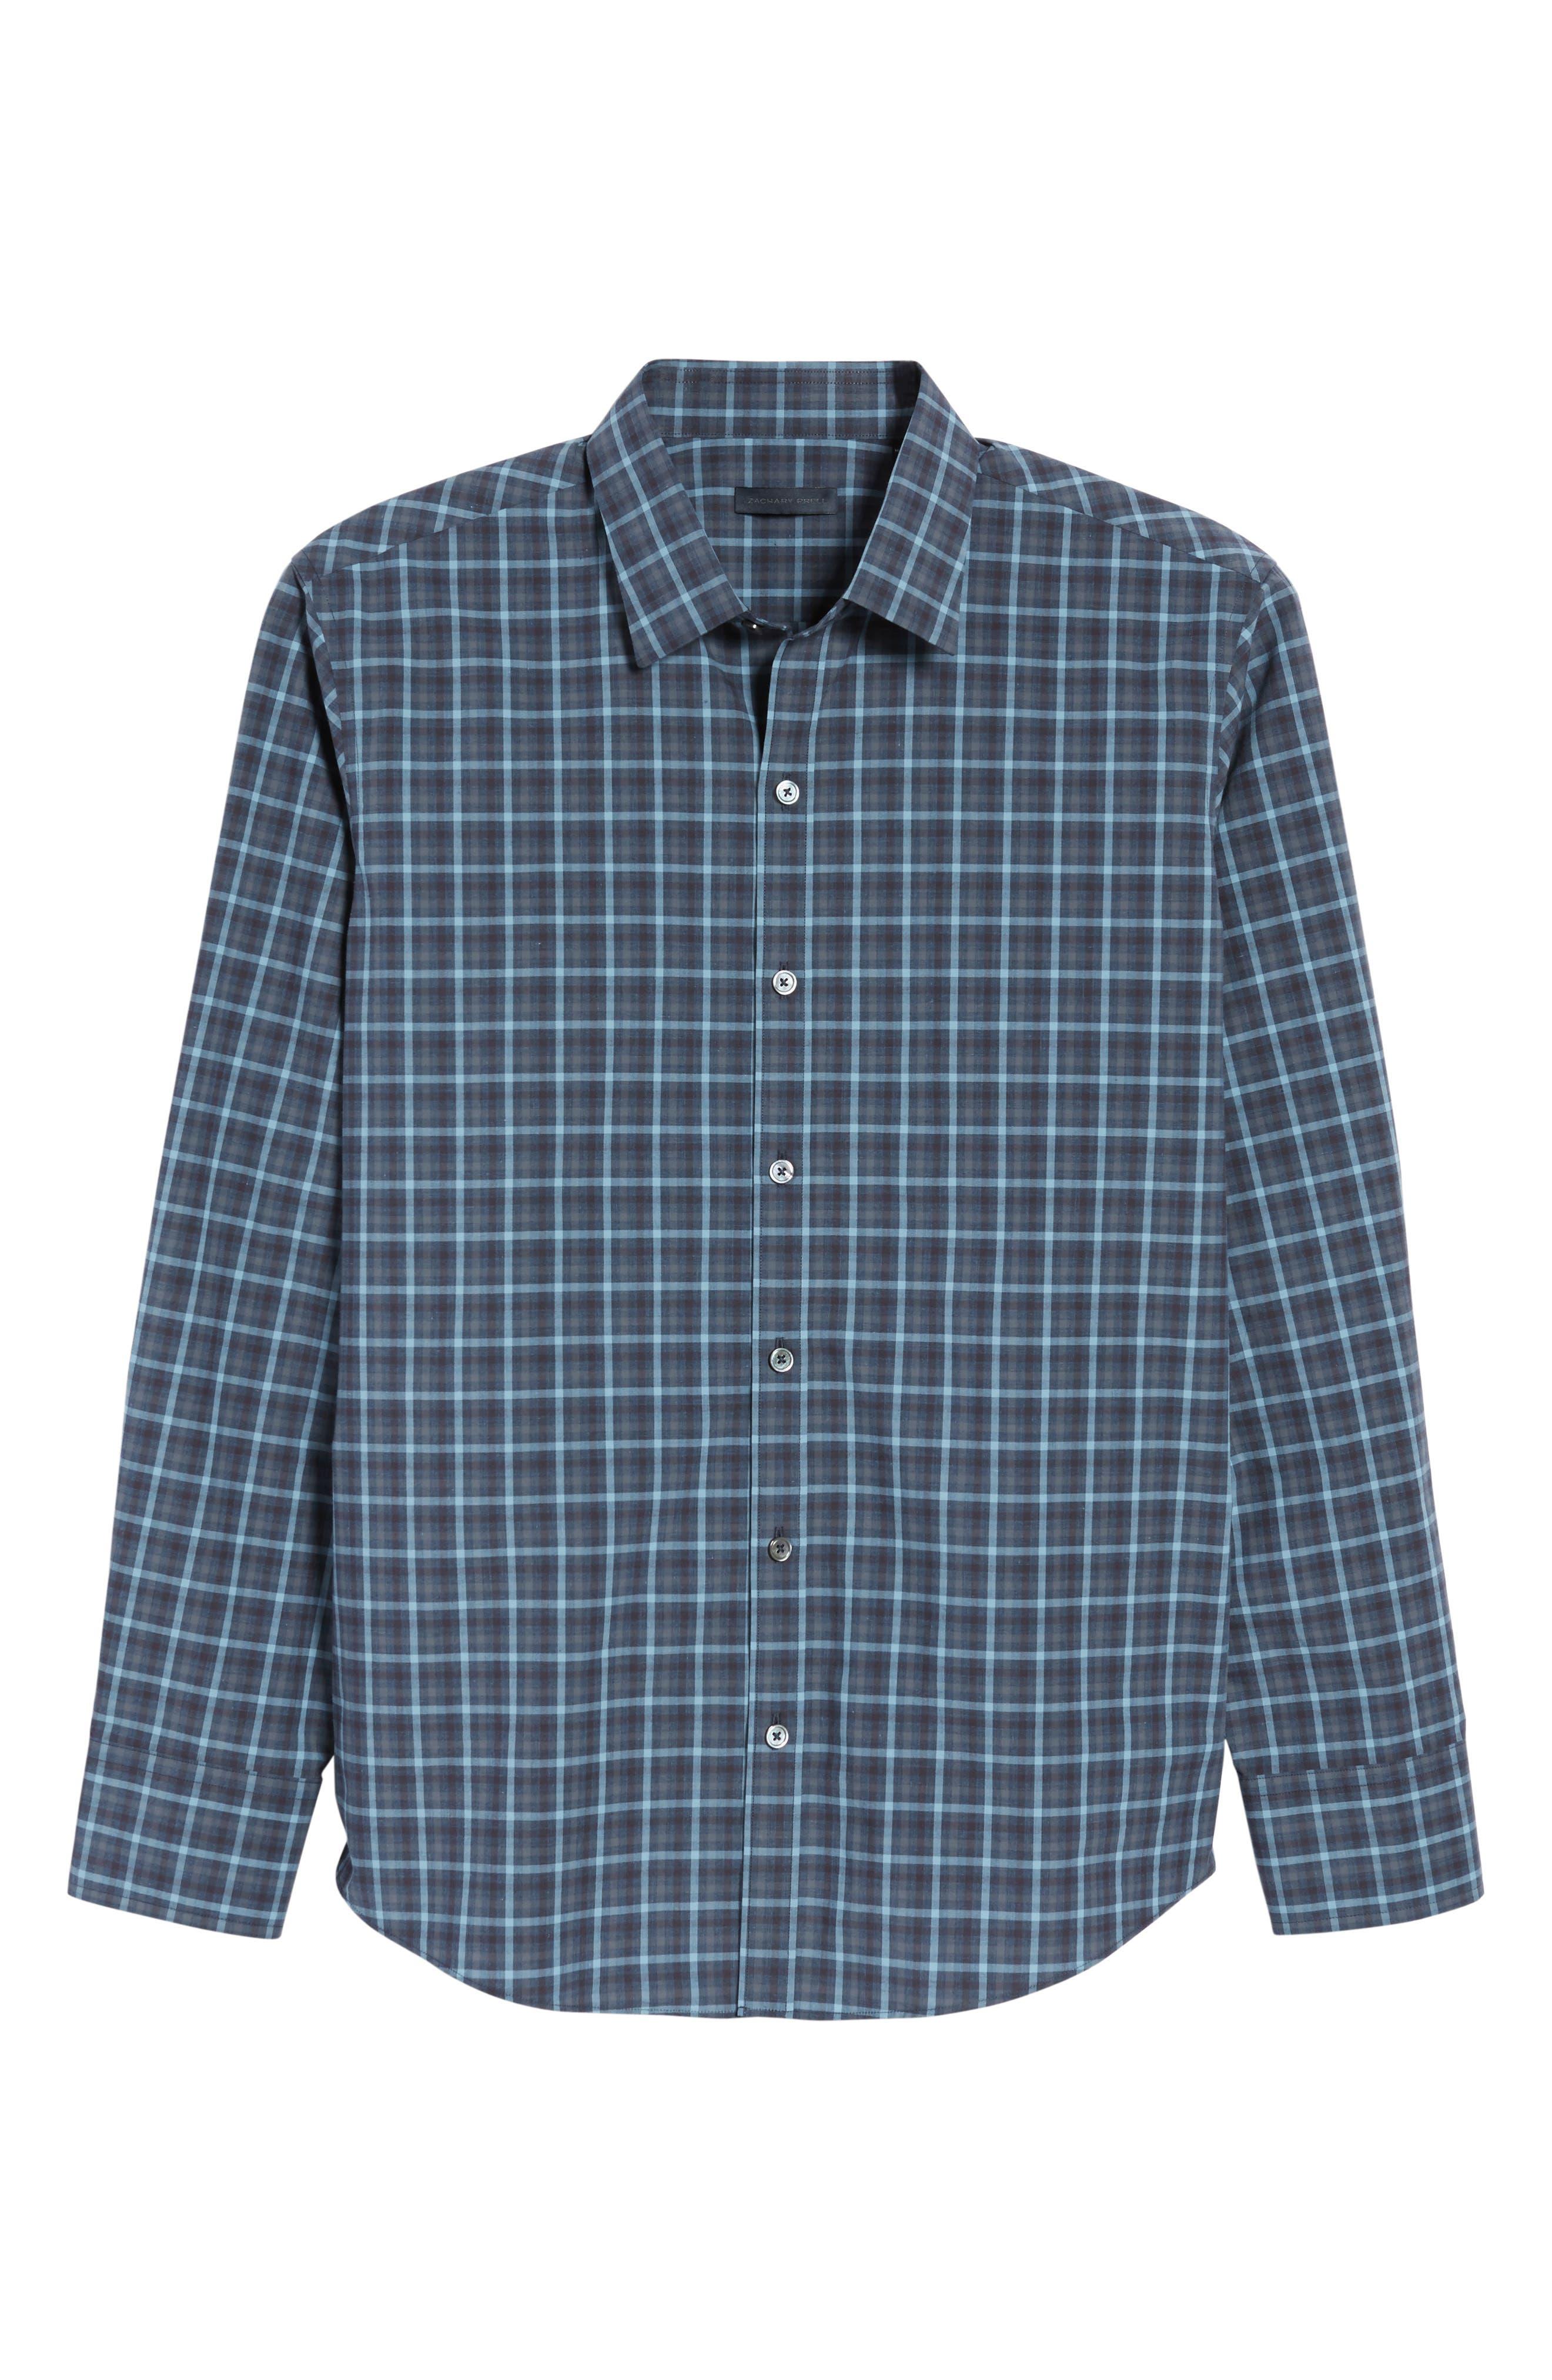 Lozado Check Sport Shirt,                             Alternate thumbnail 6, color,                             400